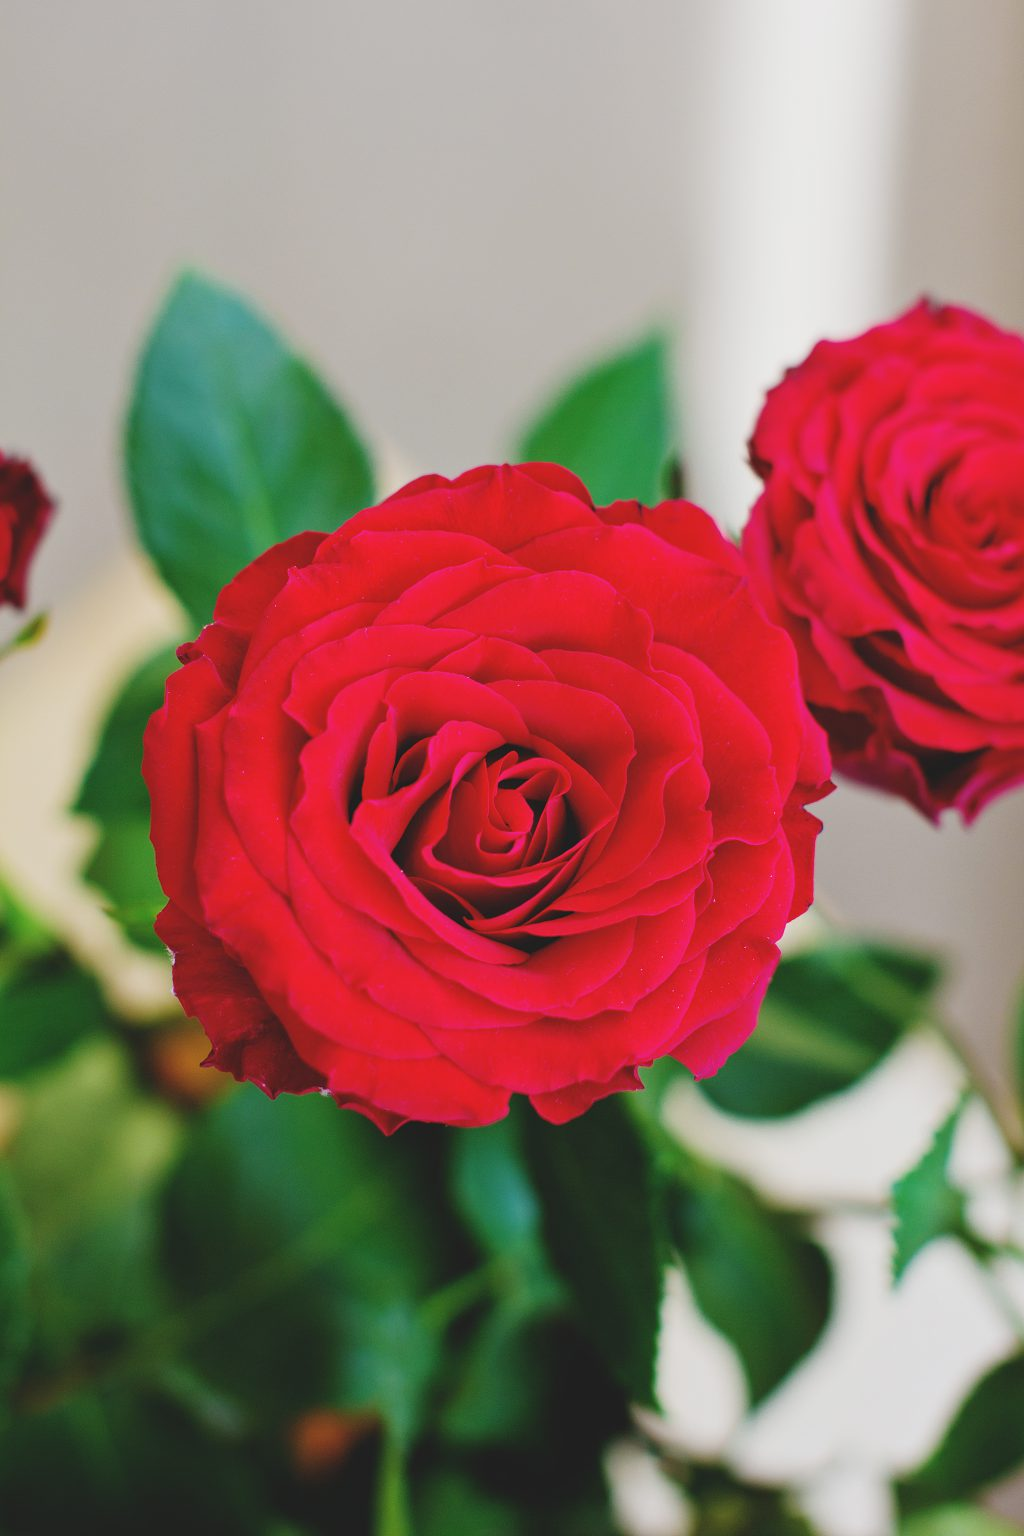 Dutch roses - free stock photo